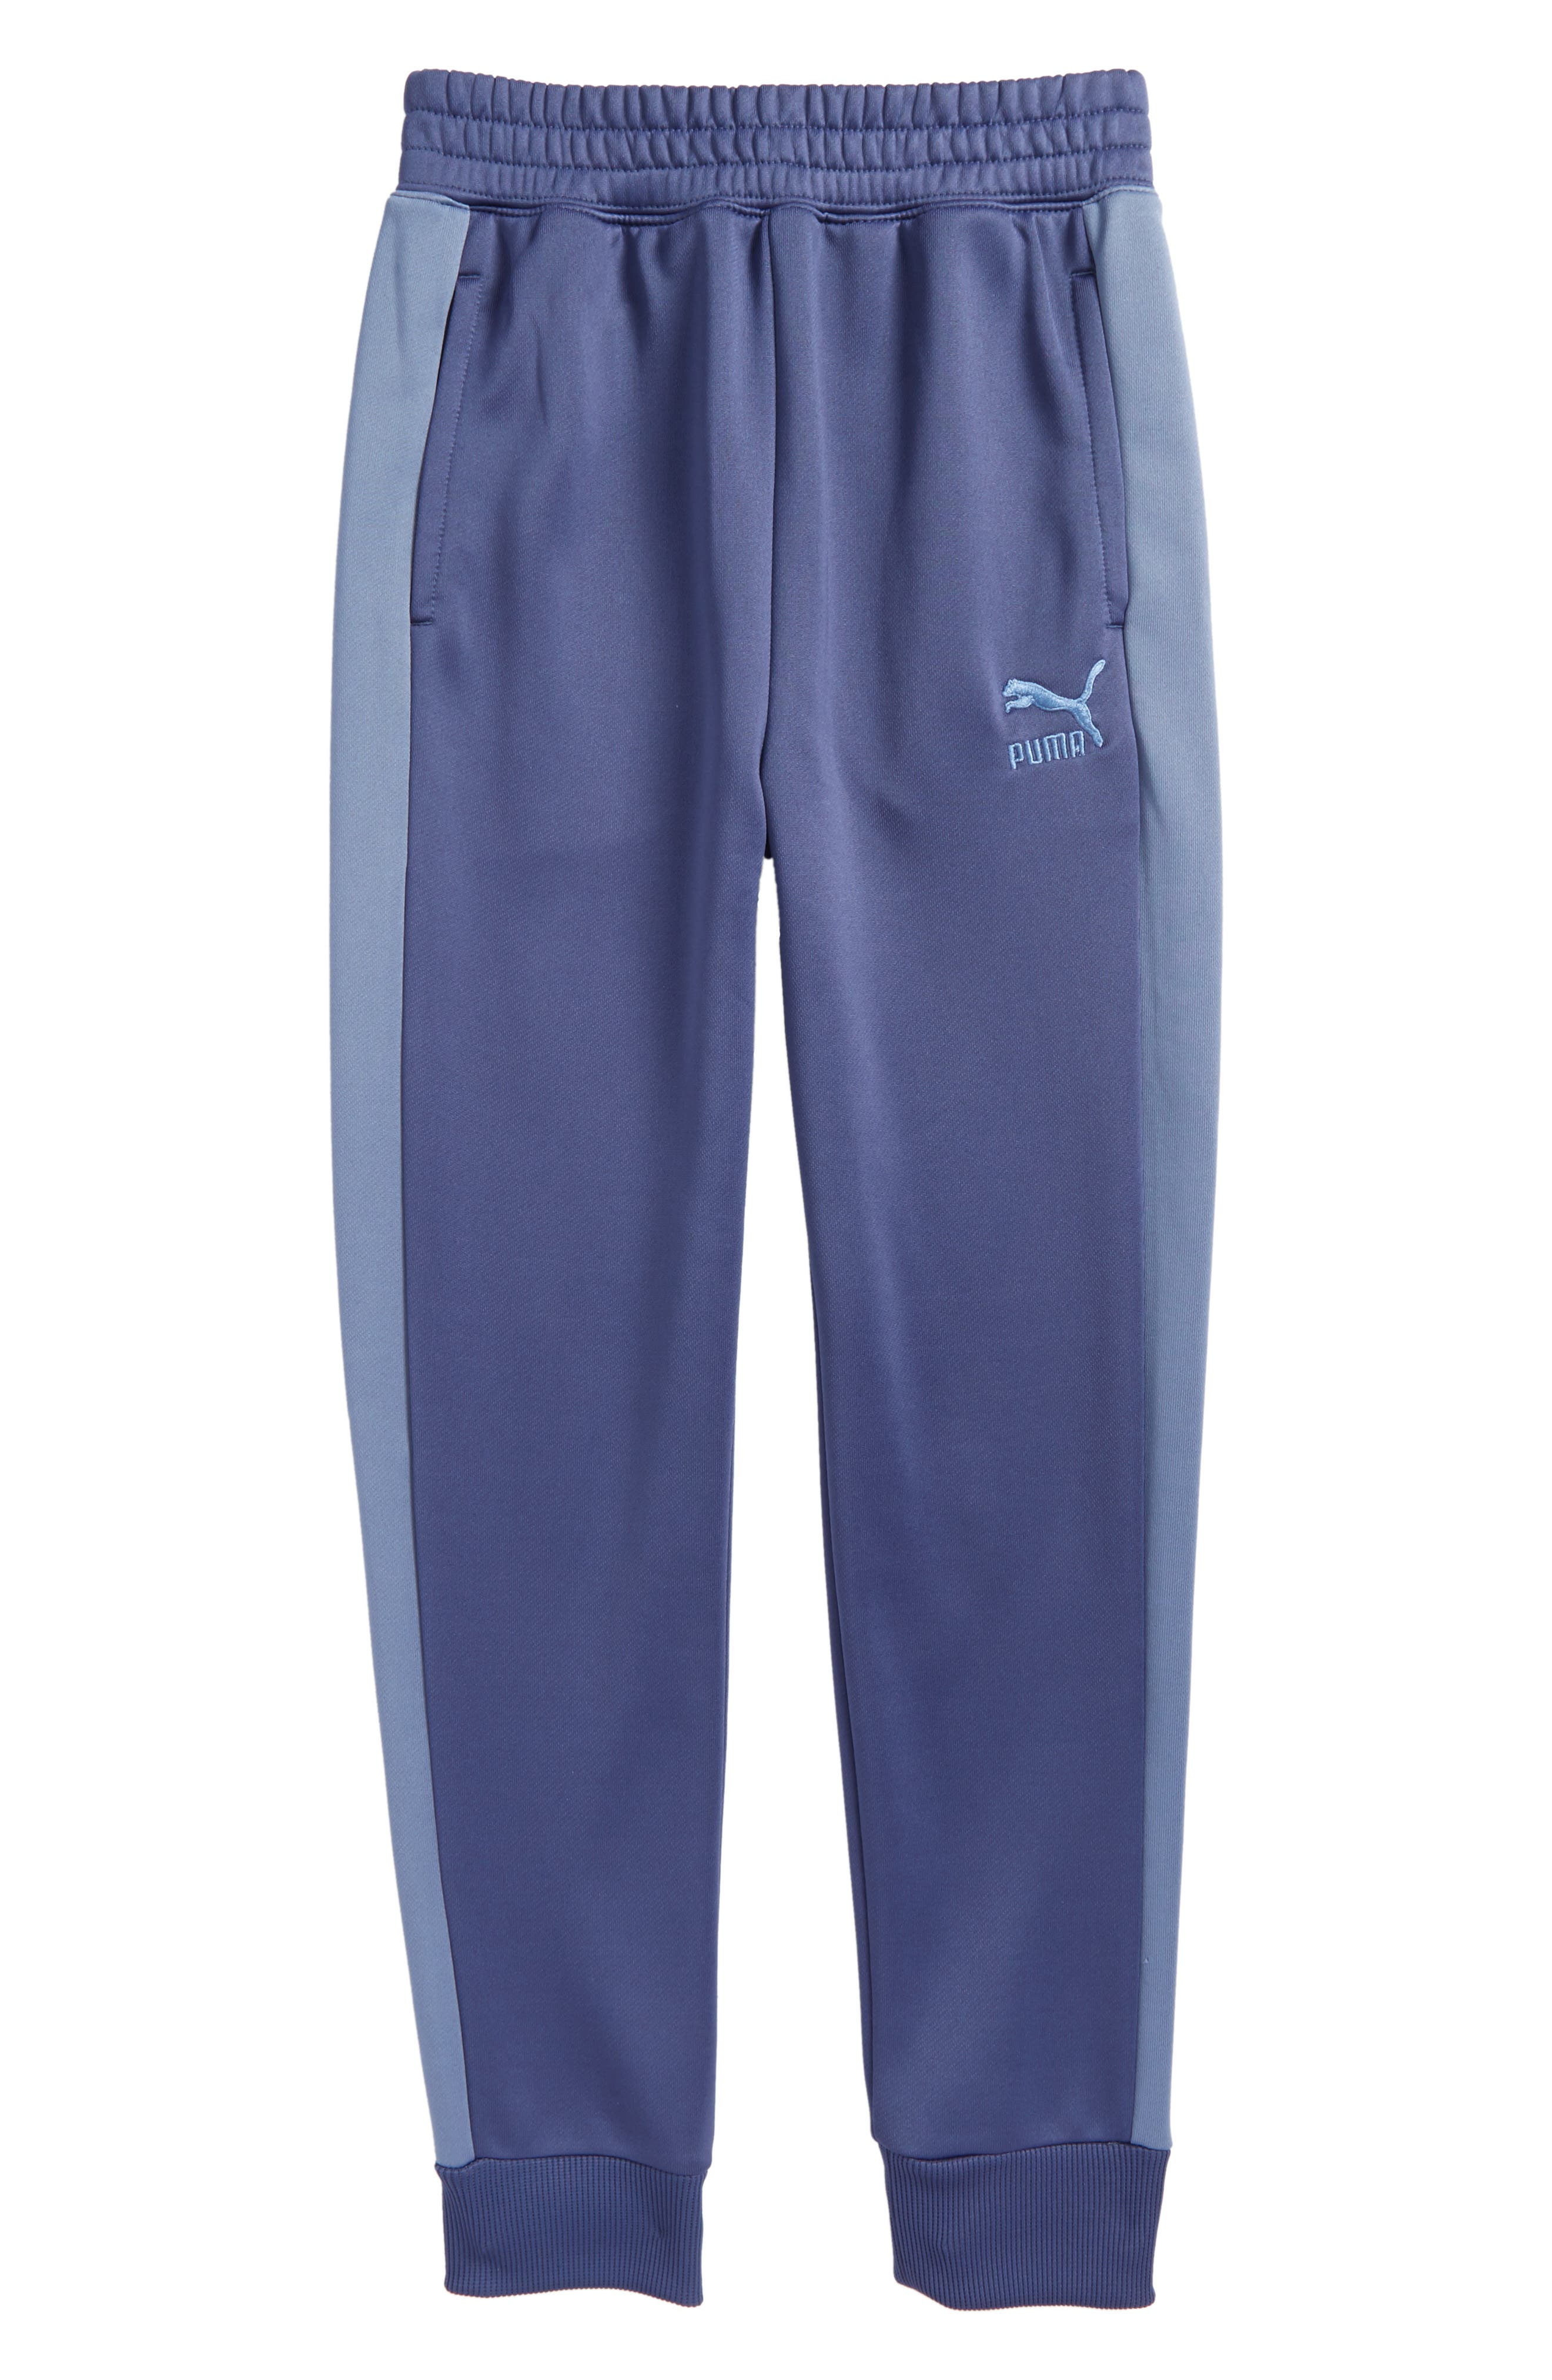 T7 Sweatpants,                         Main,                         color, Blue Indigo